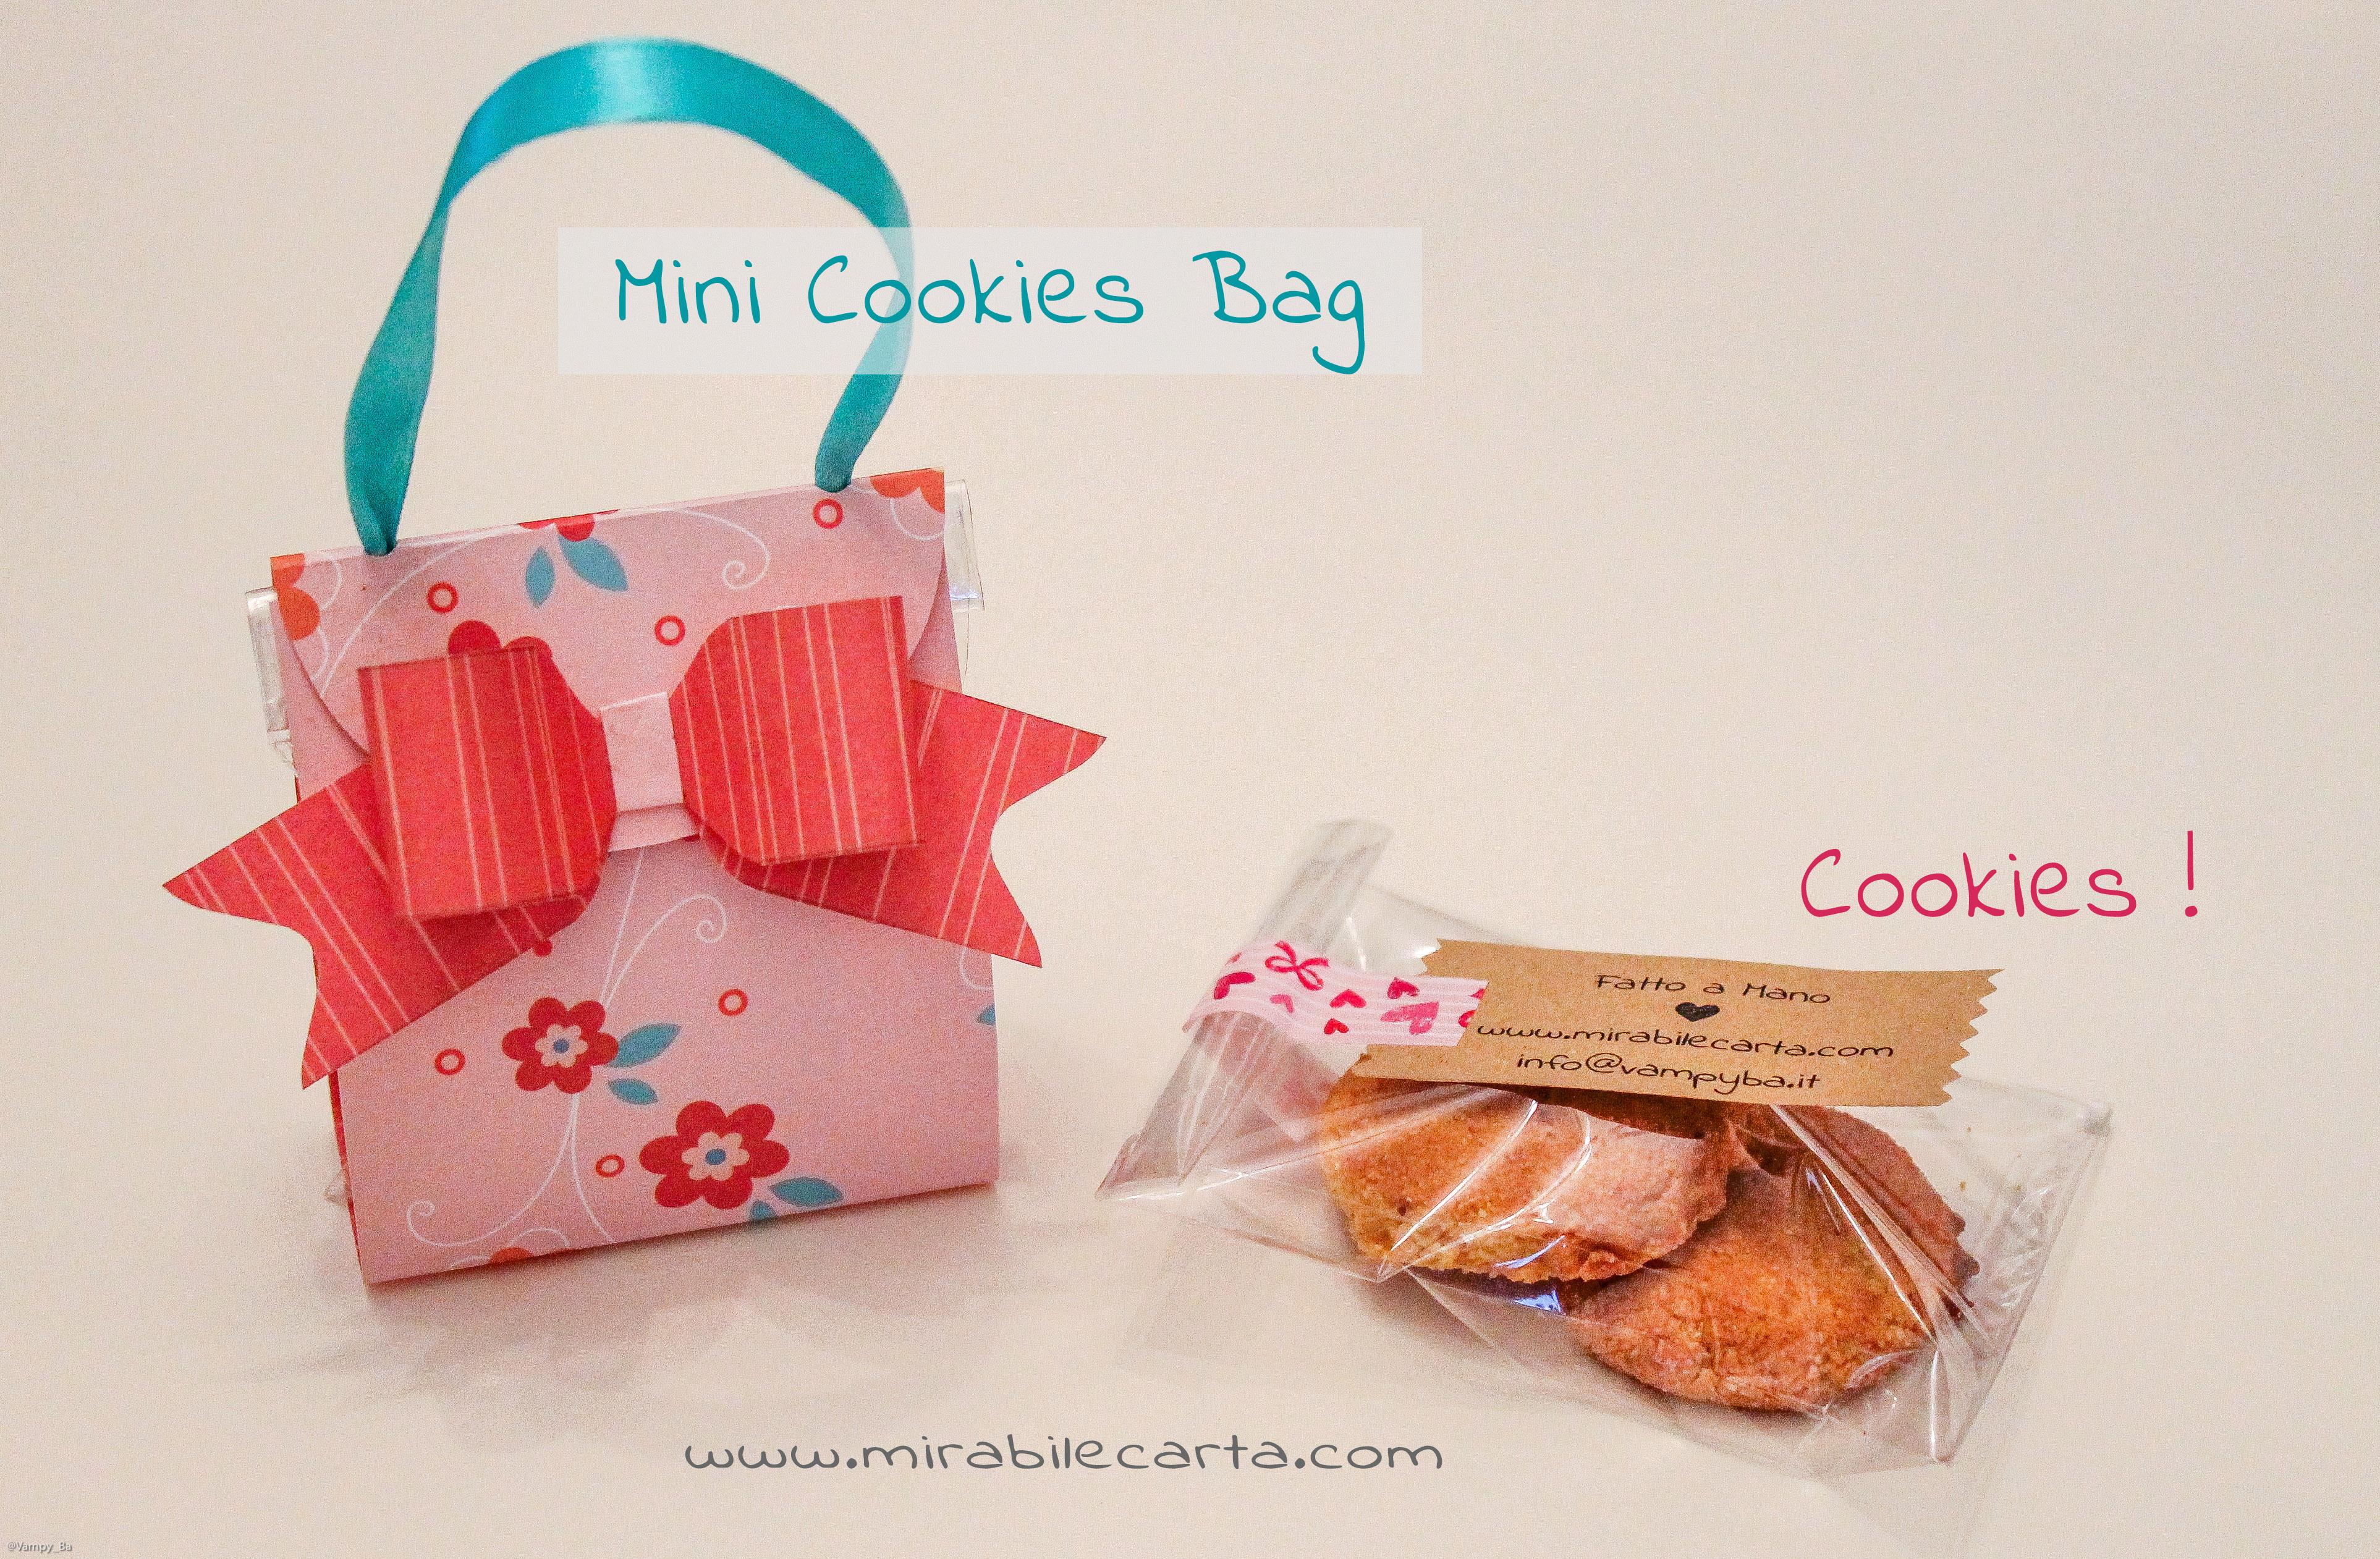 minicookiebagsmirabilecarta02_ba.jpg